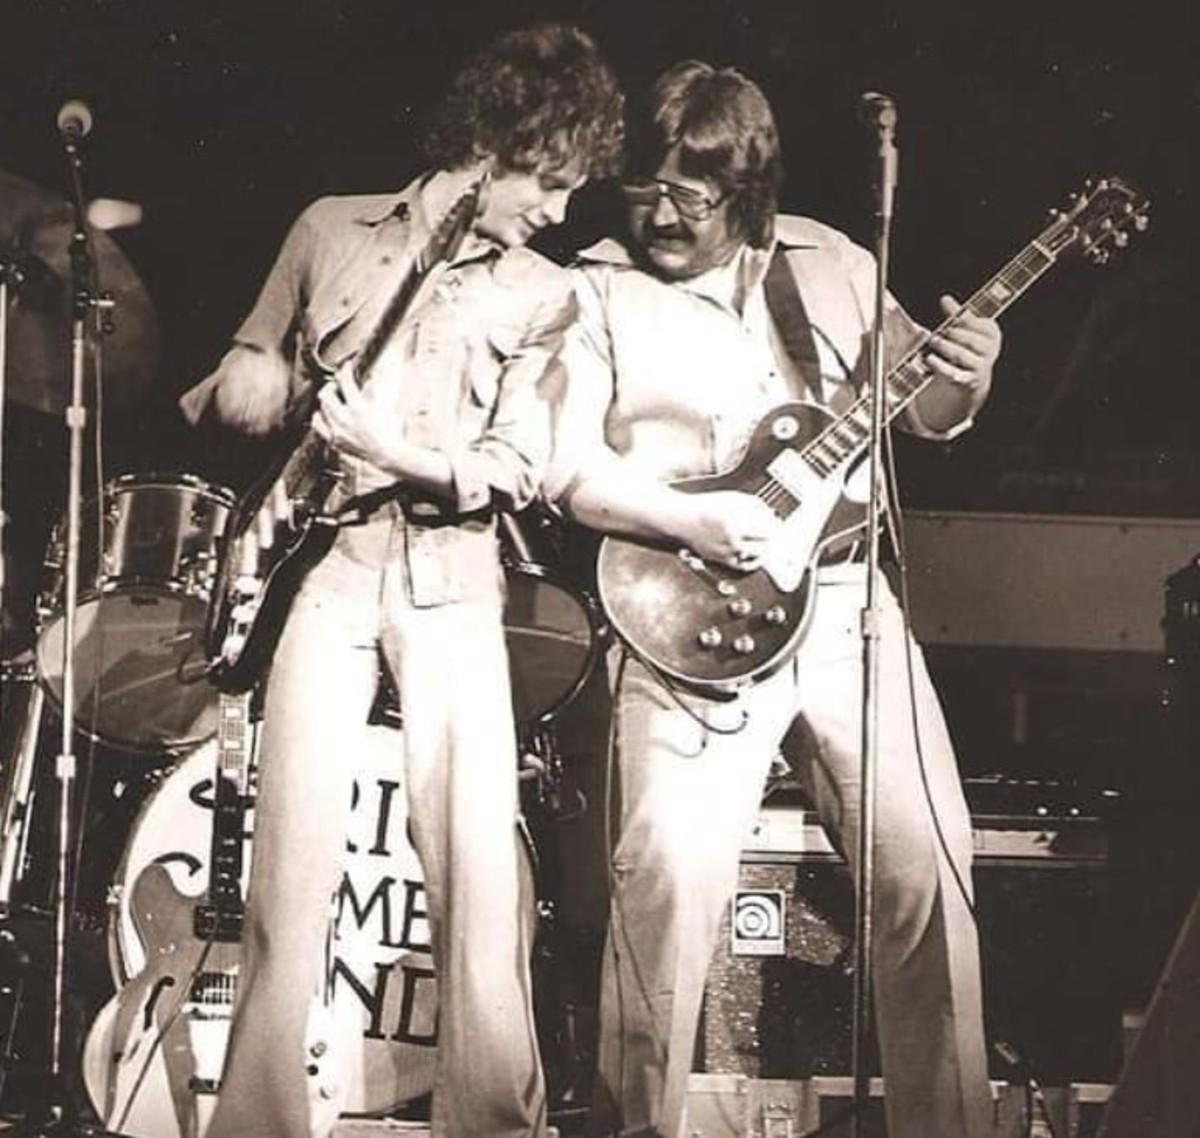 Eric Carmen and Dan Hrdlicka mid-1970s courtesy of Richard Reising